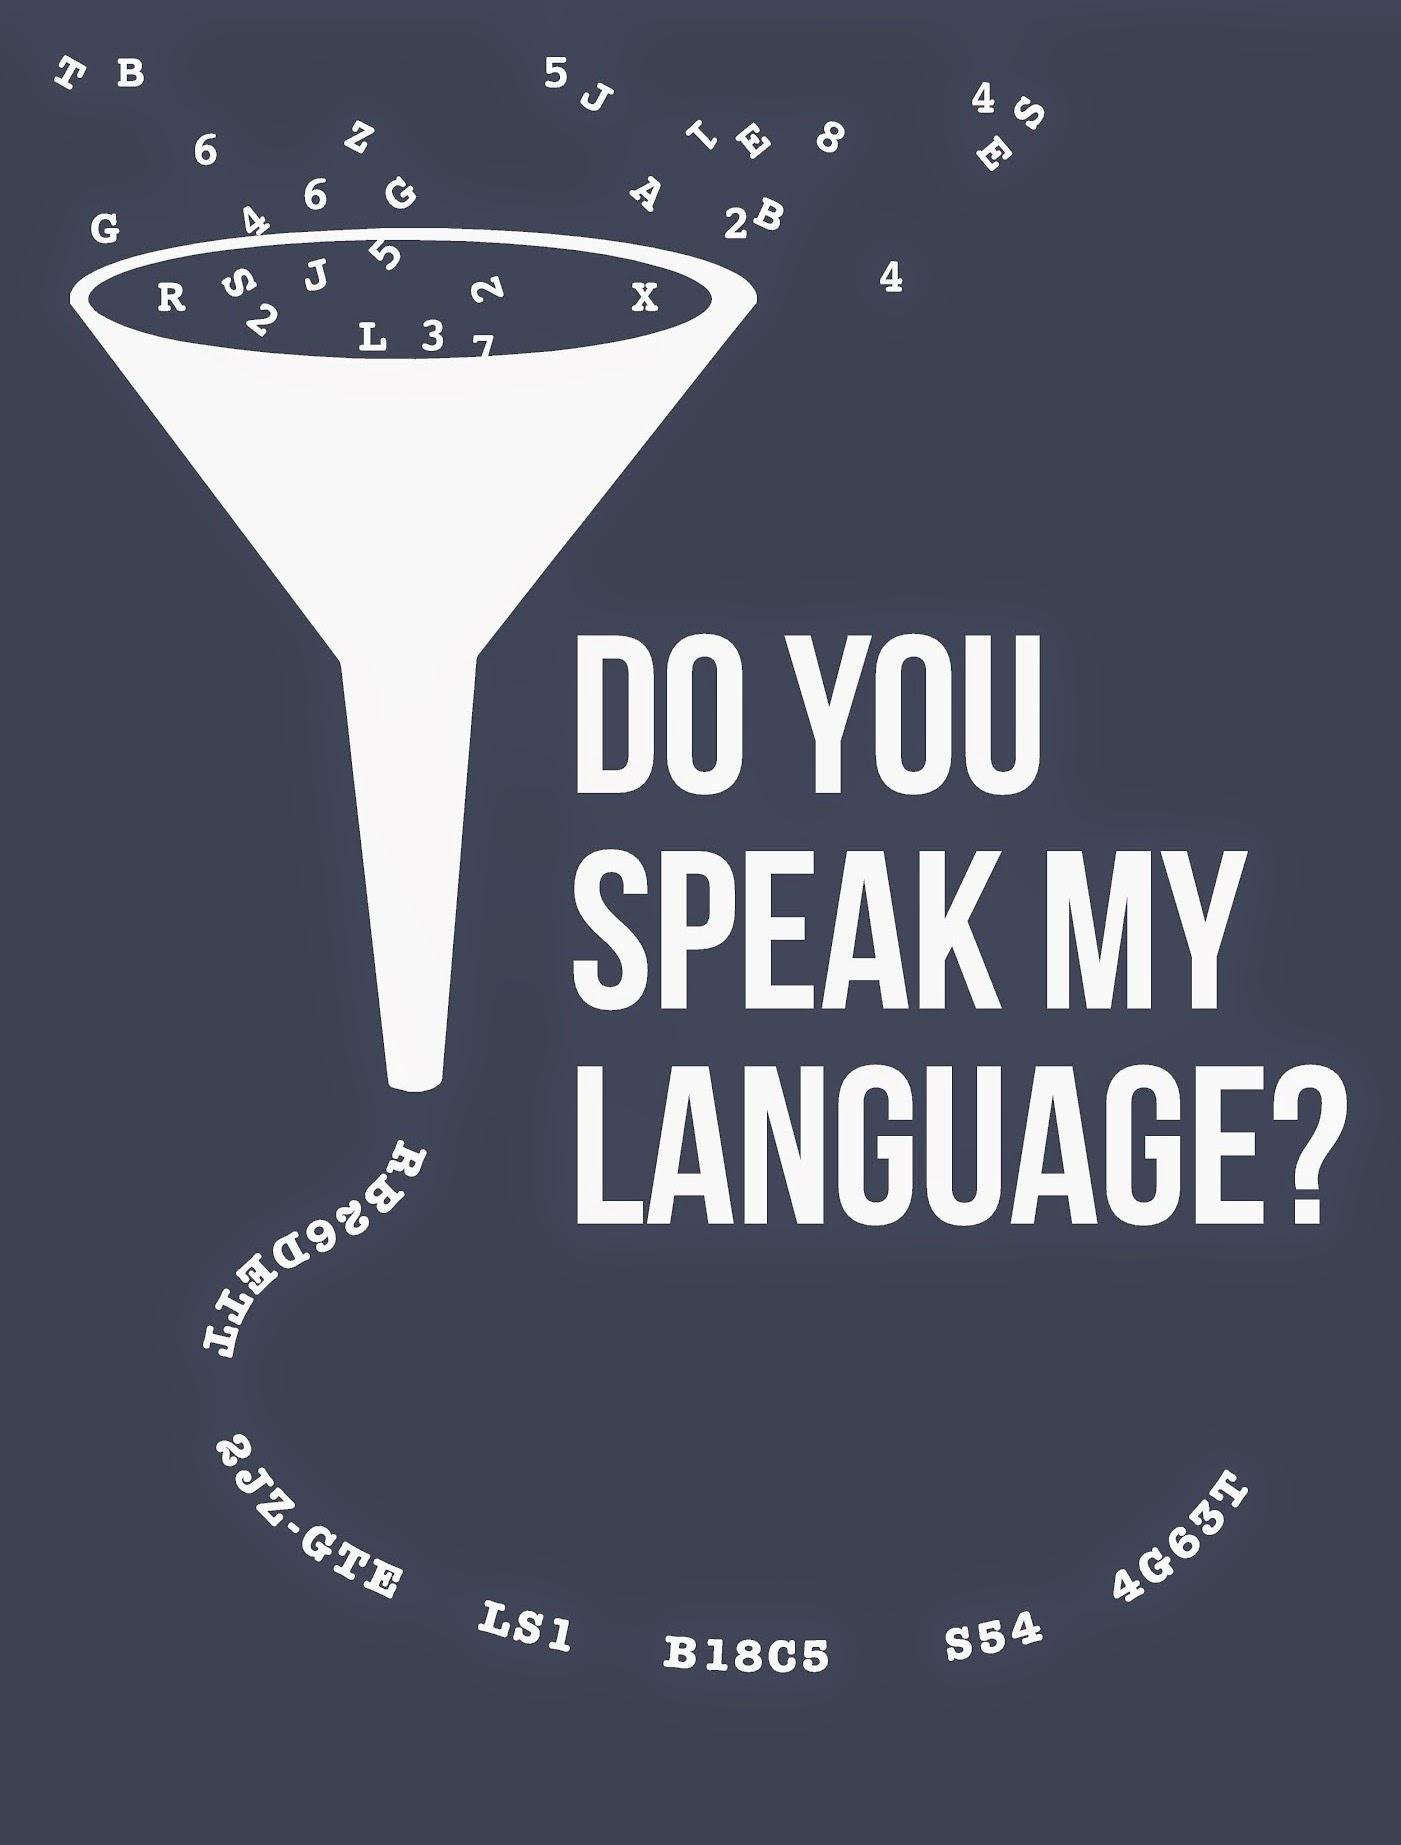 Do You Speak My Language?